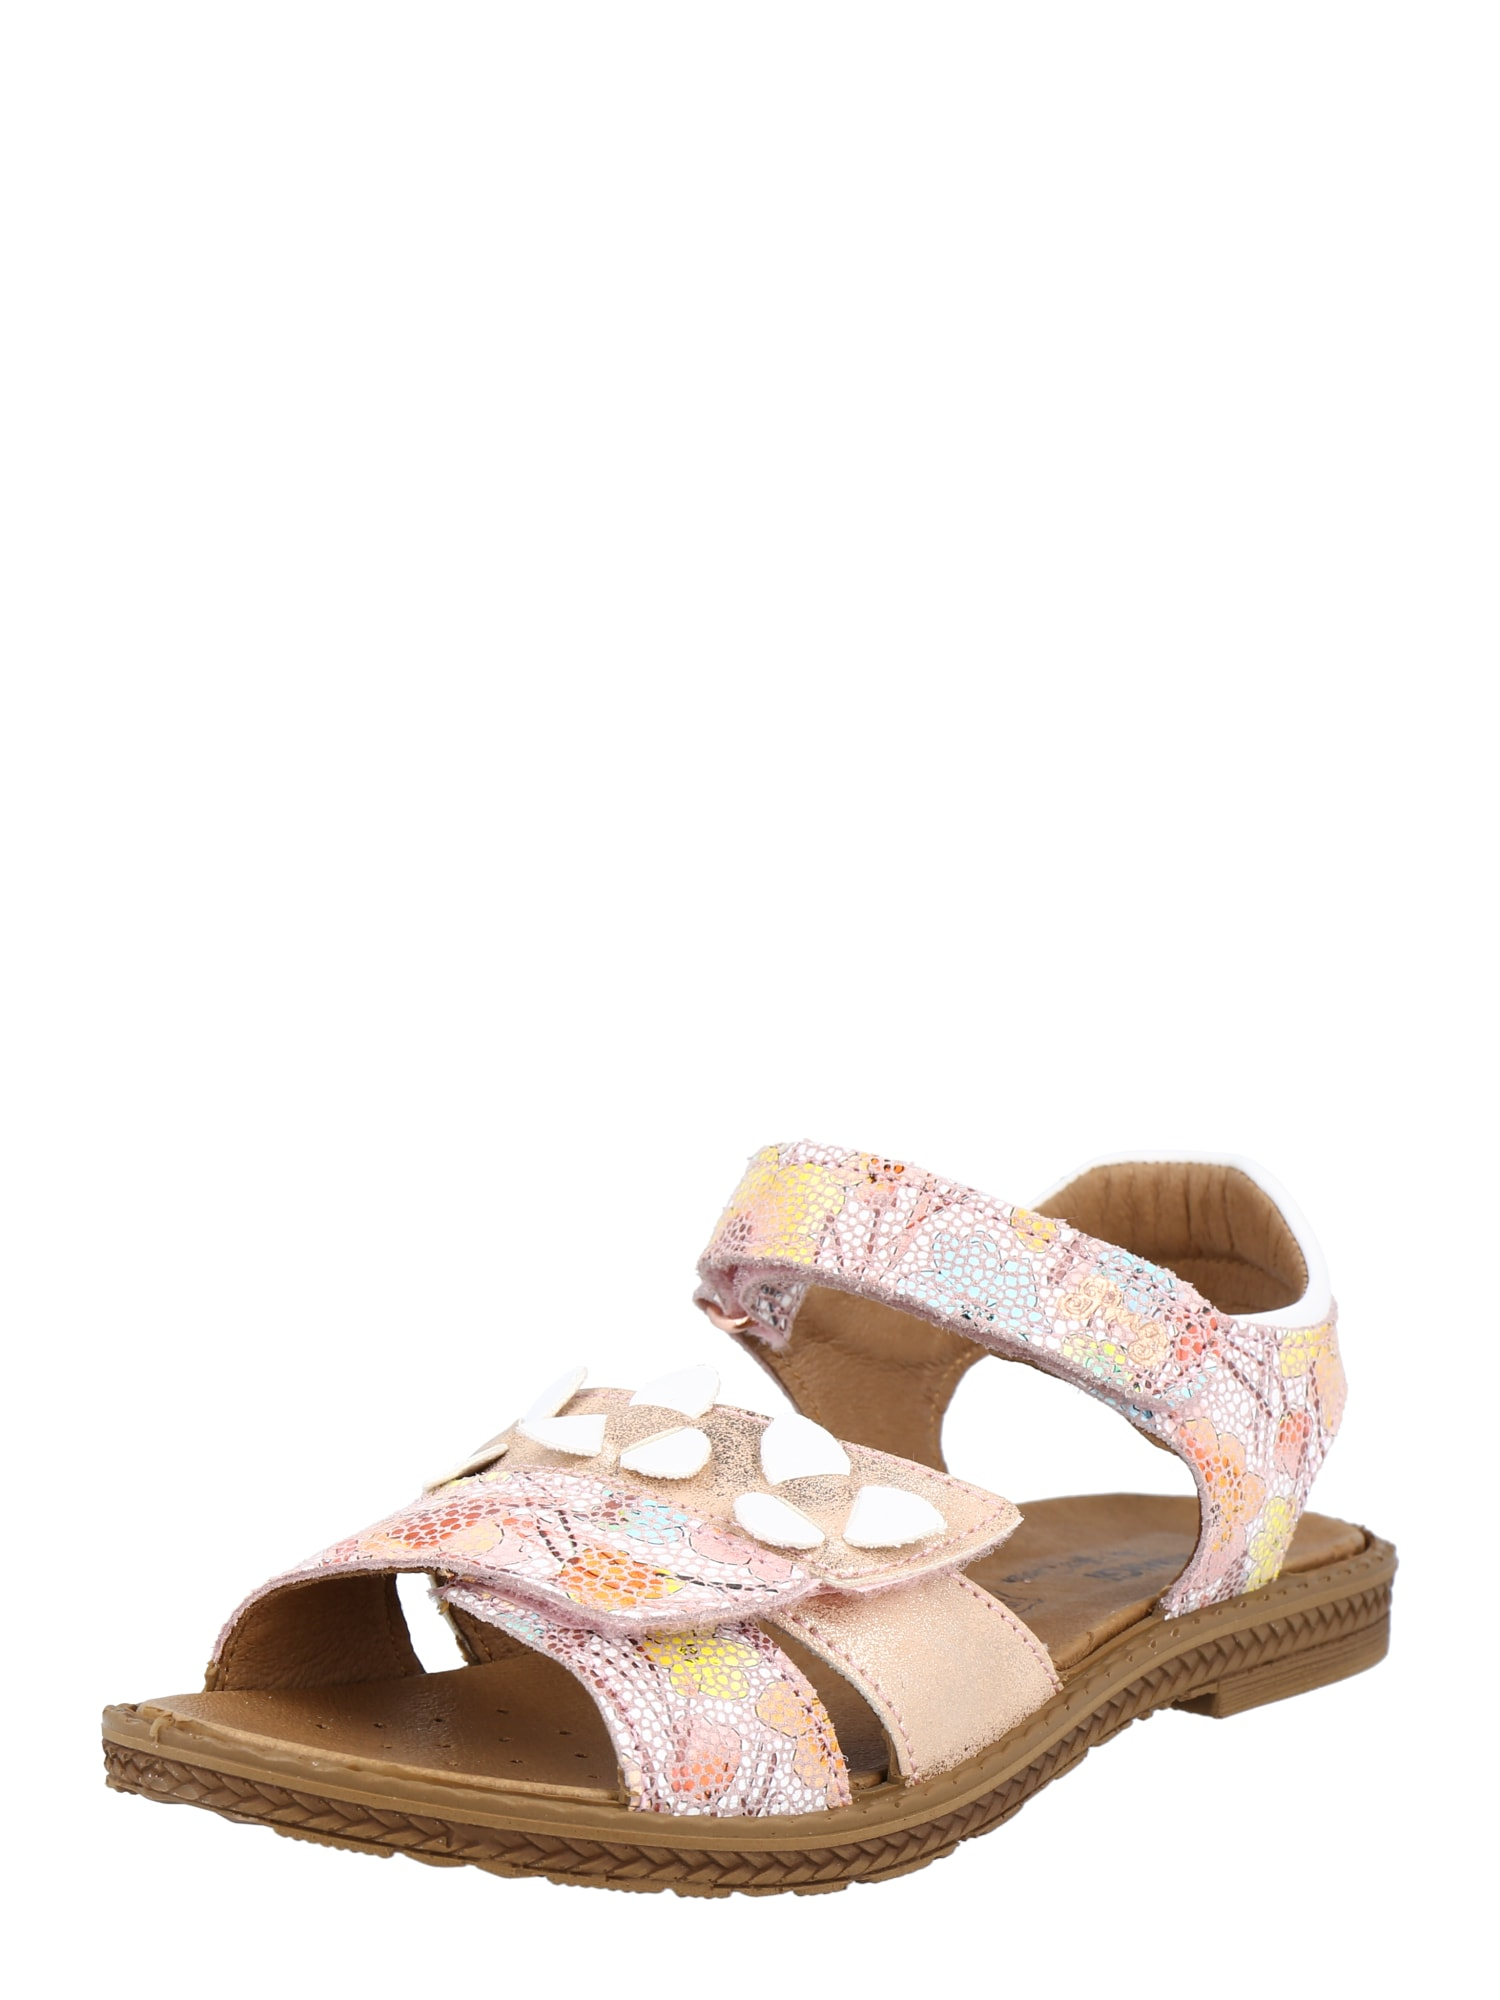 PRIMIGI Sandalai rožių spalva / persikų spalva / geltona / balta / vandens spalva